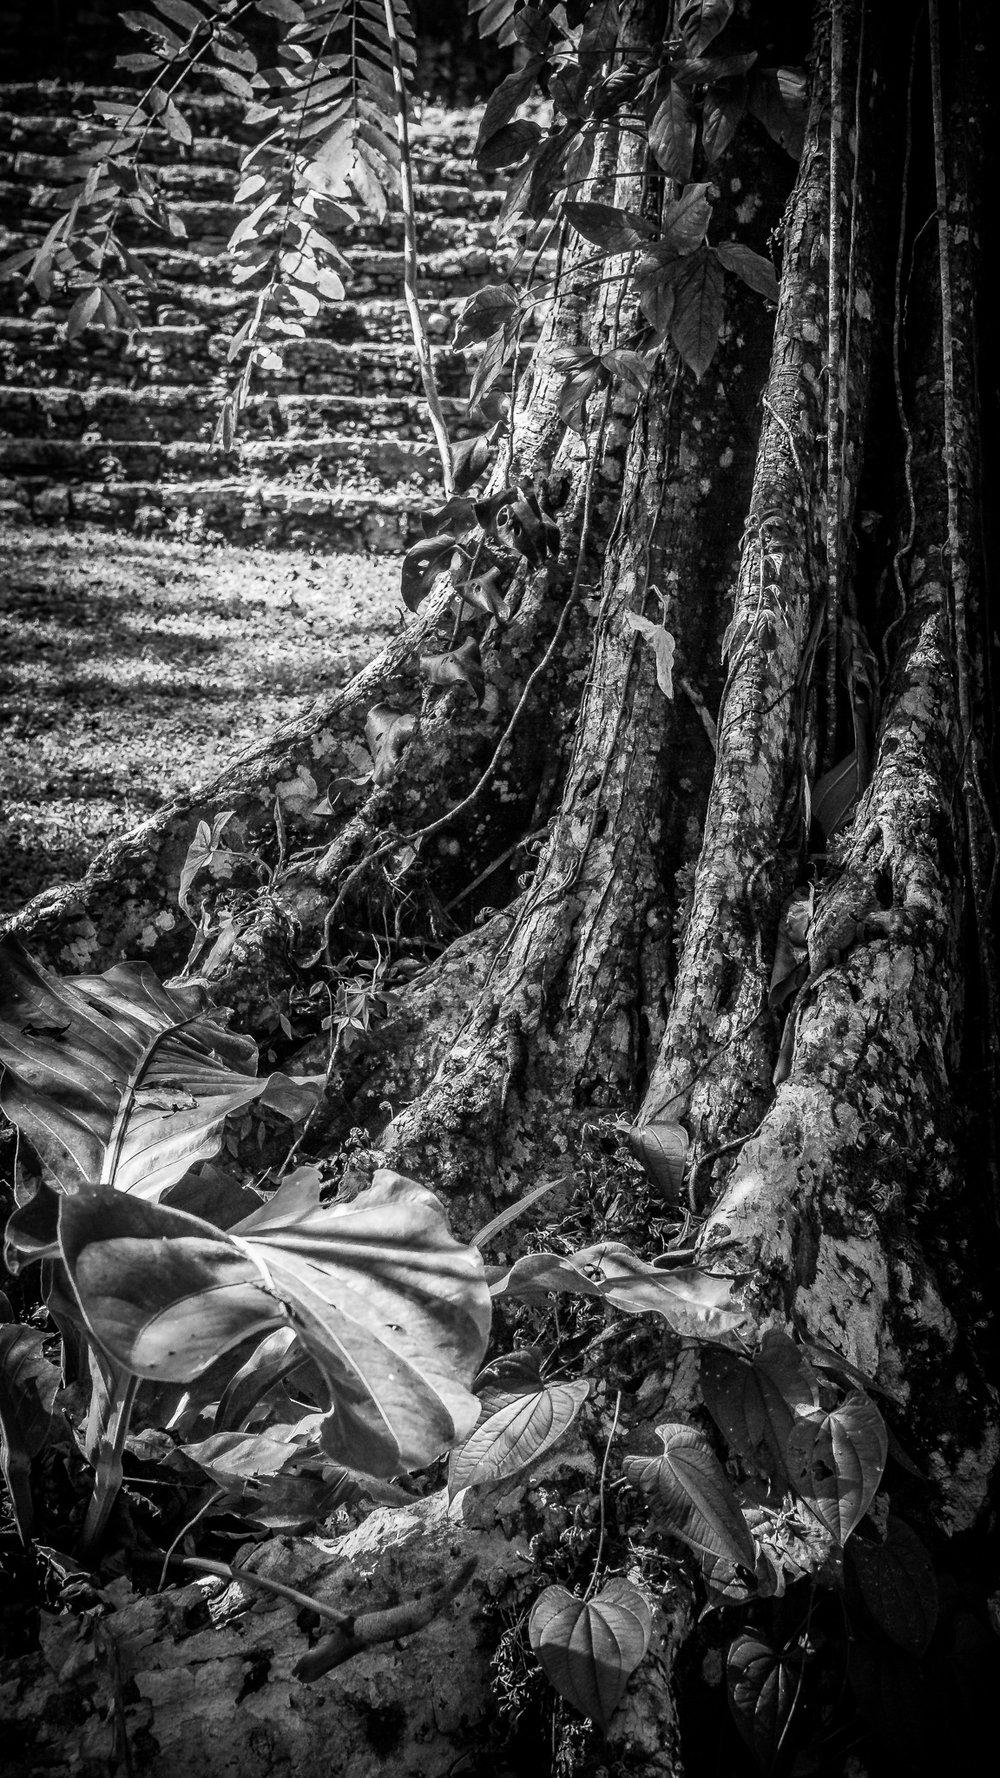 2017 - ChiapasTrip_D3_56112017 - 67.jpg